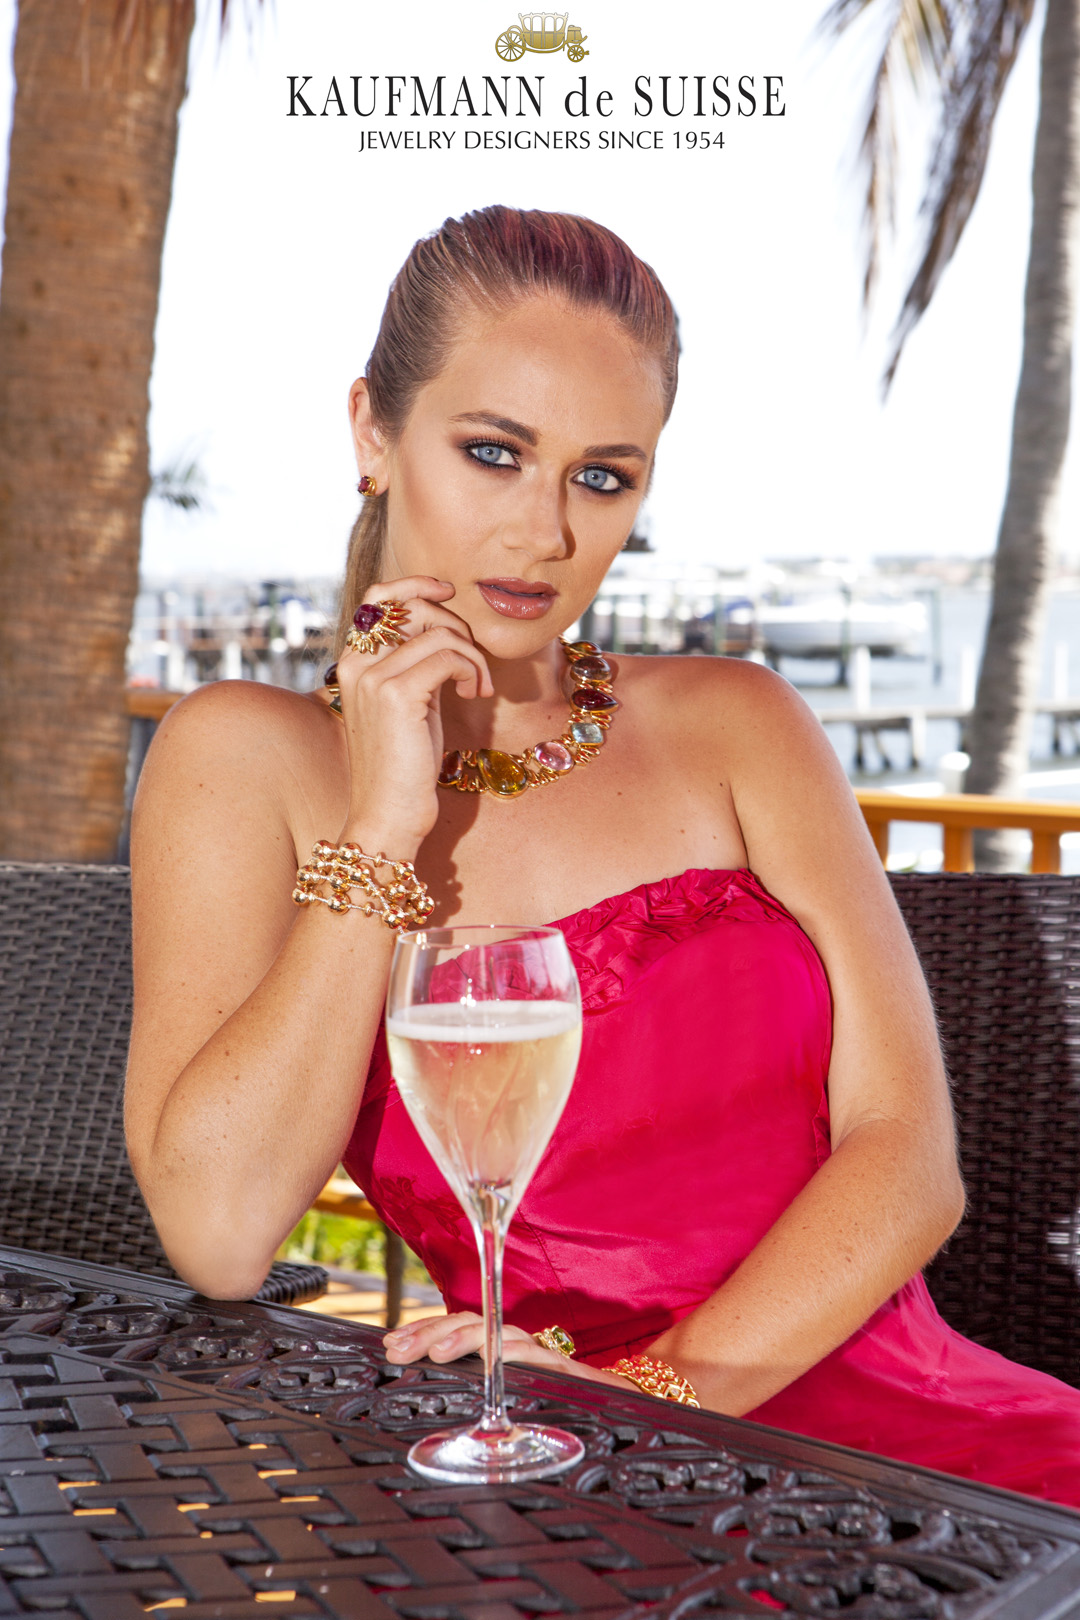 Gold Beaded Bracelet and Tourmaline Necklace